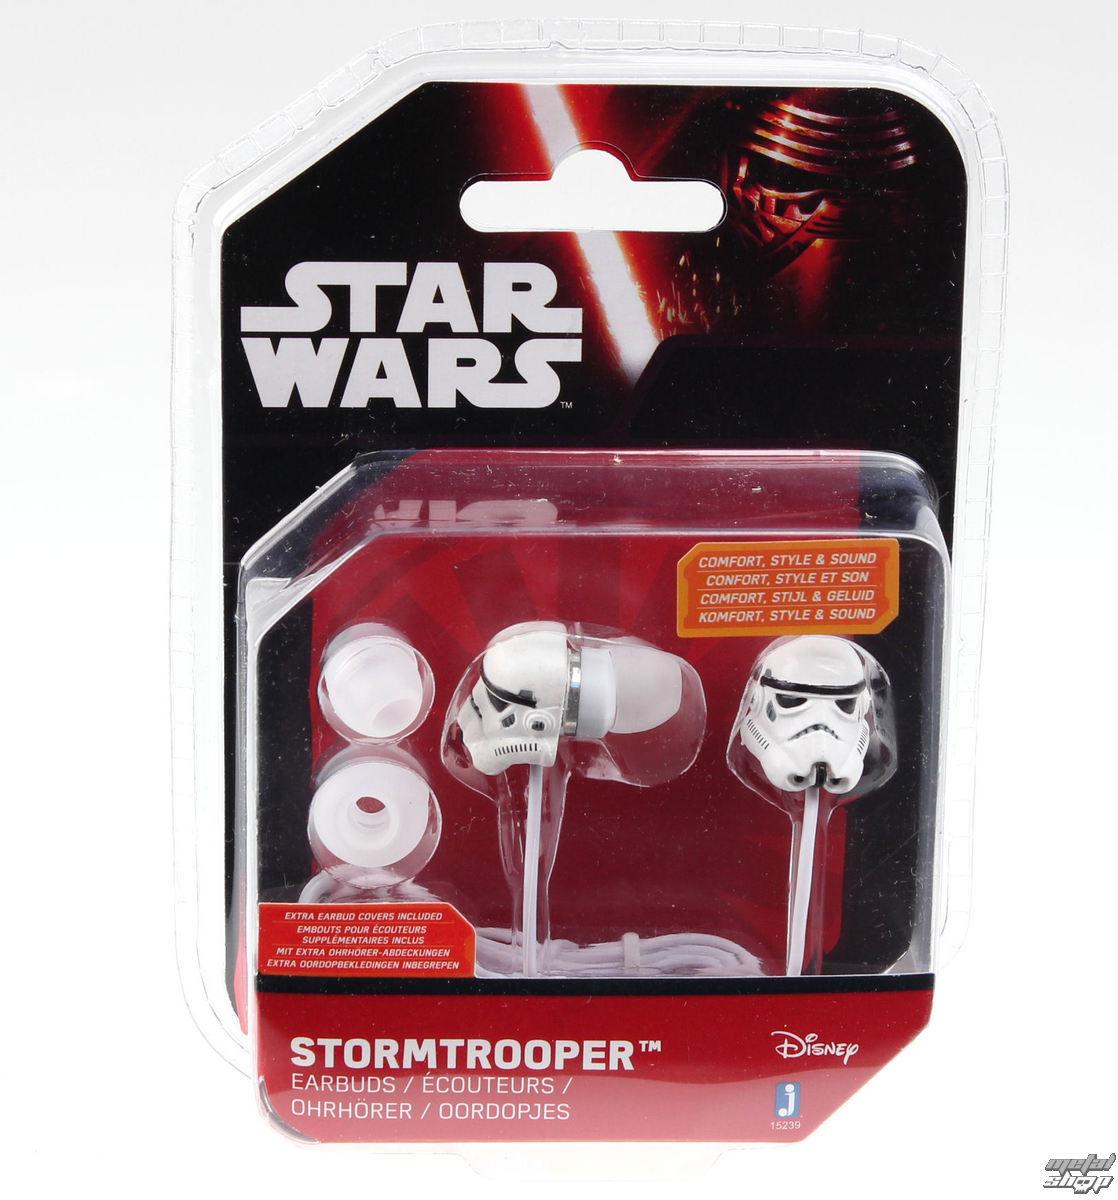 slúchadlá Star Wars - Stormtrooper - Wht - JAZ15230(3)